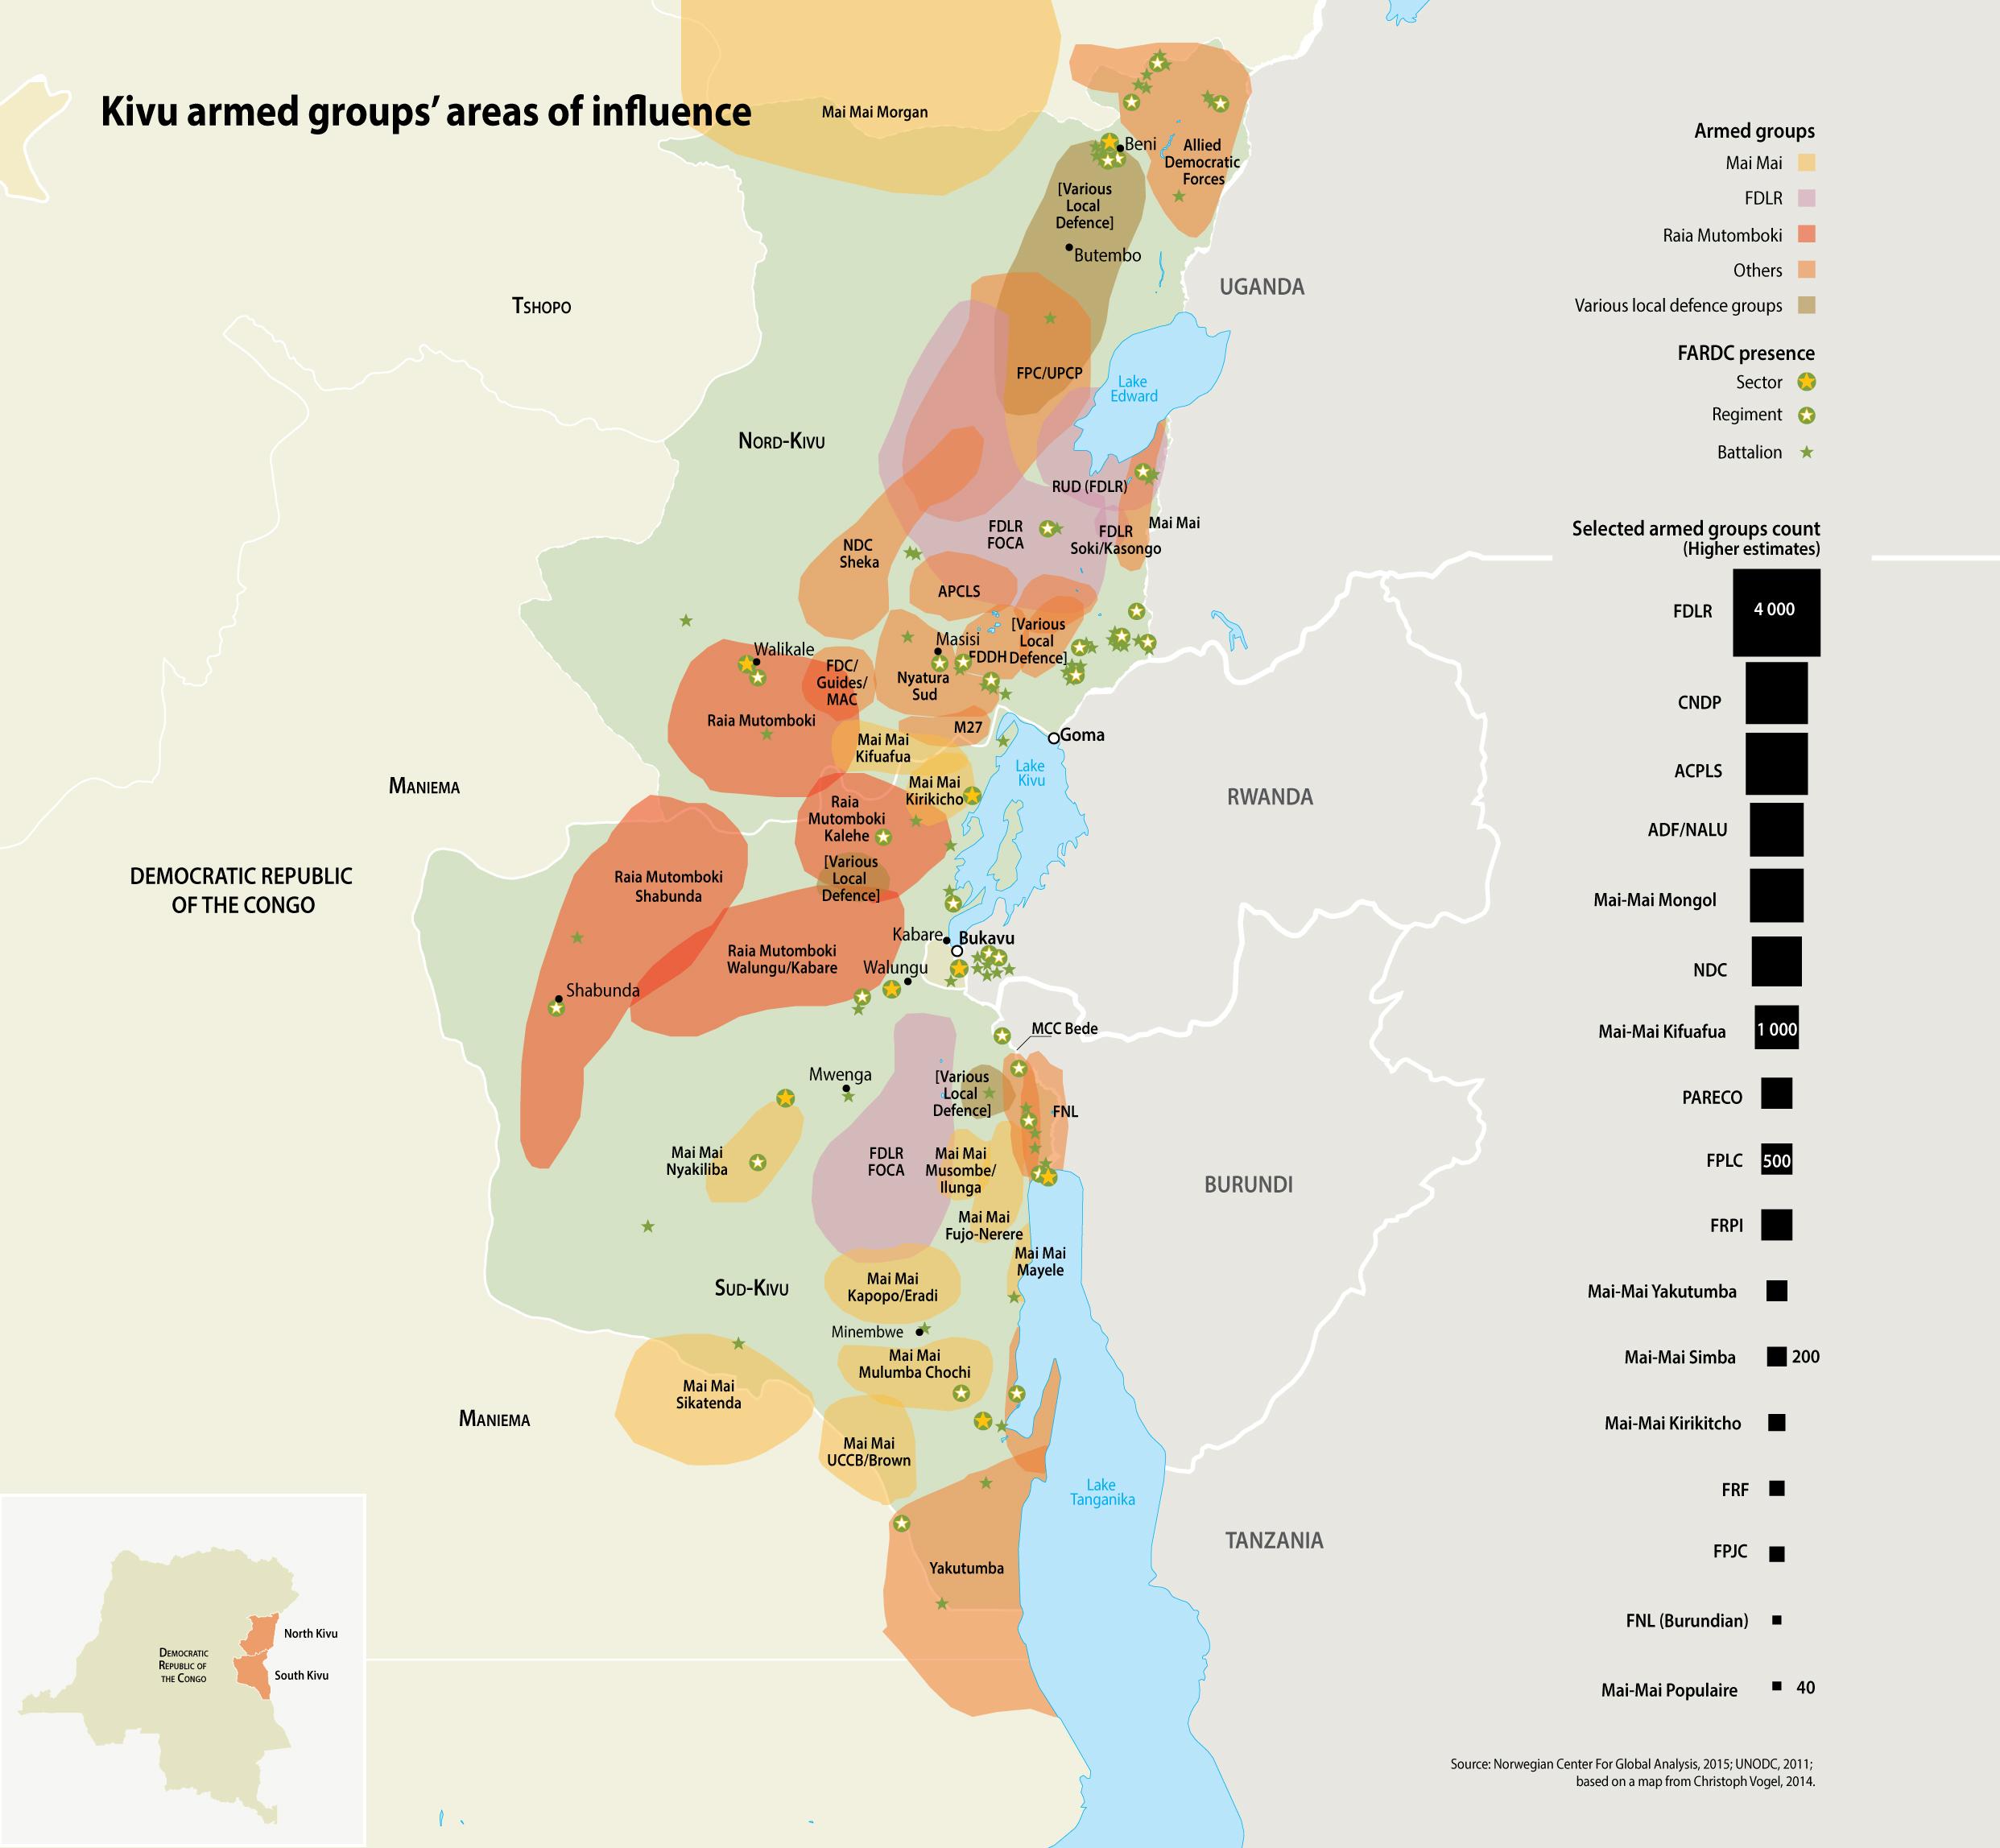 Armed groups in Kivu, DRC